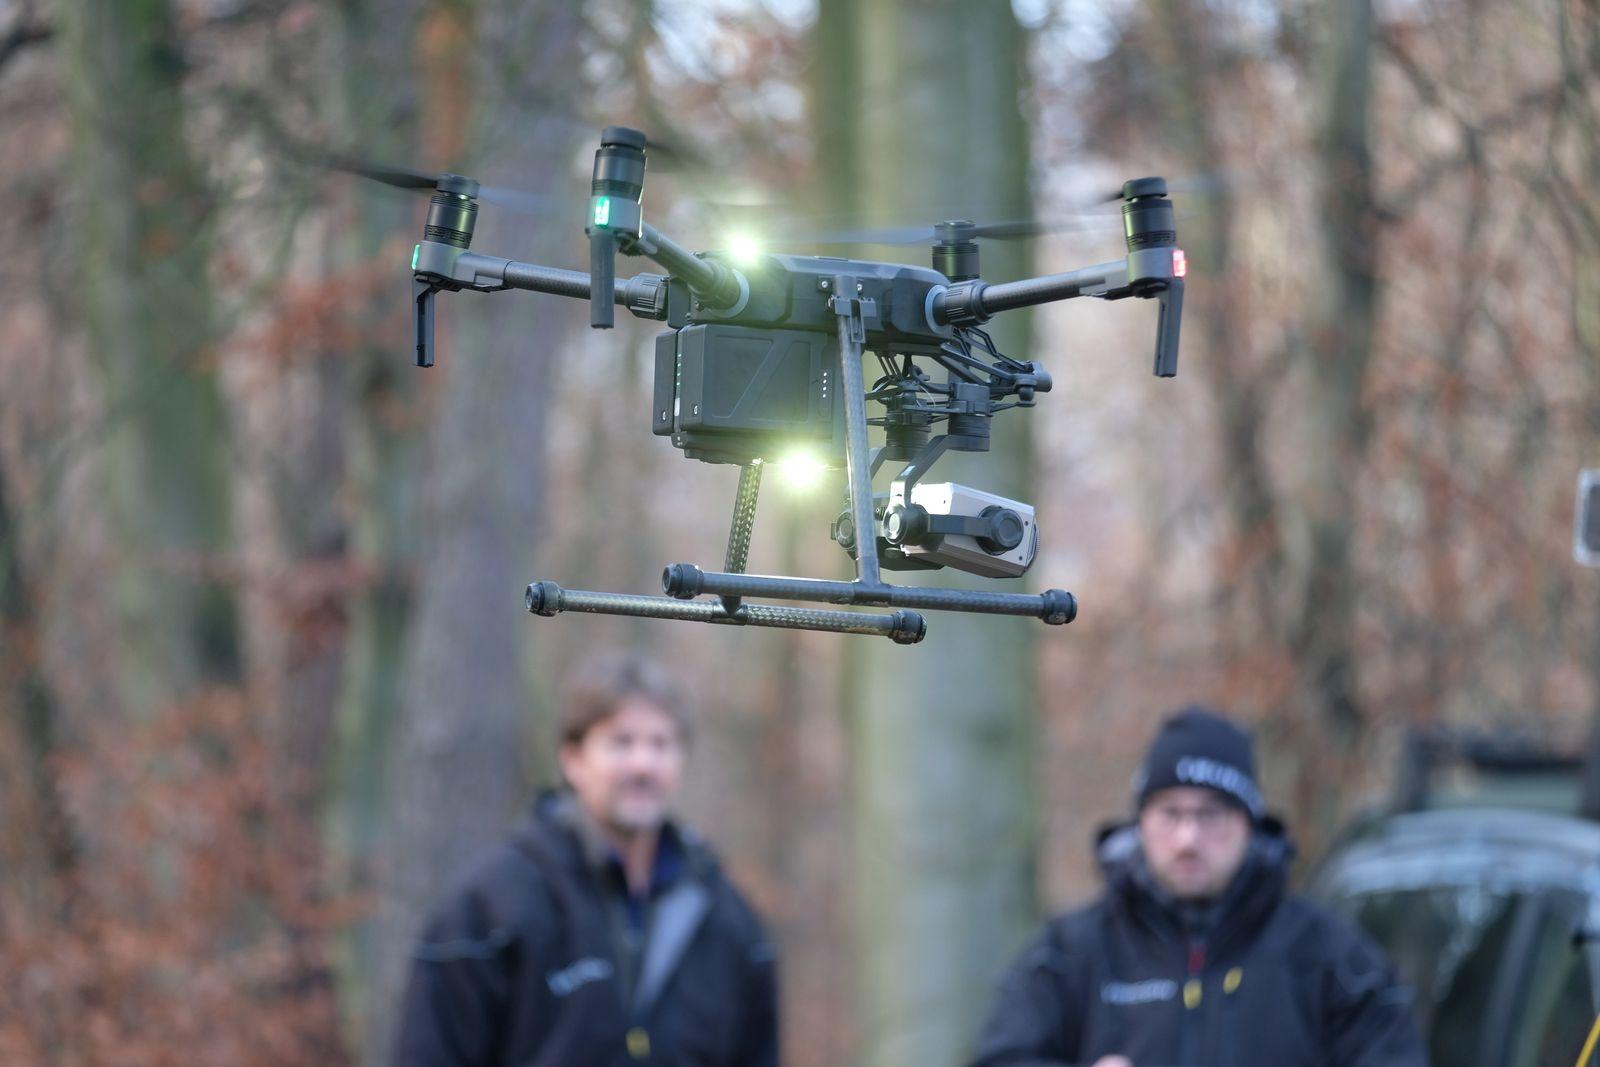 Trends/ Netzwelt/ Drohne